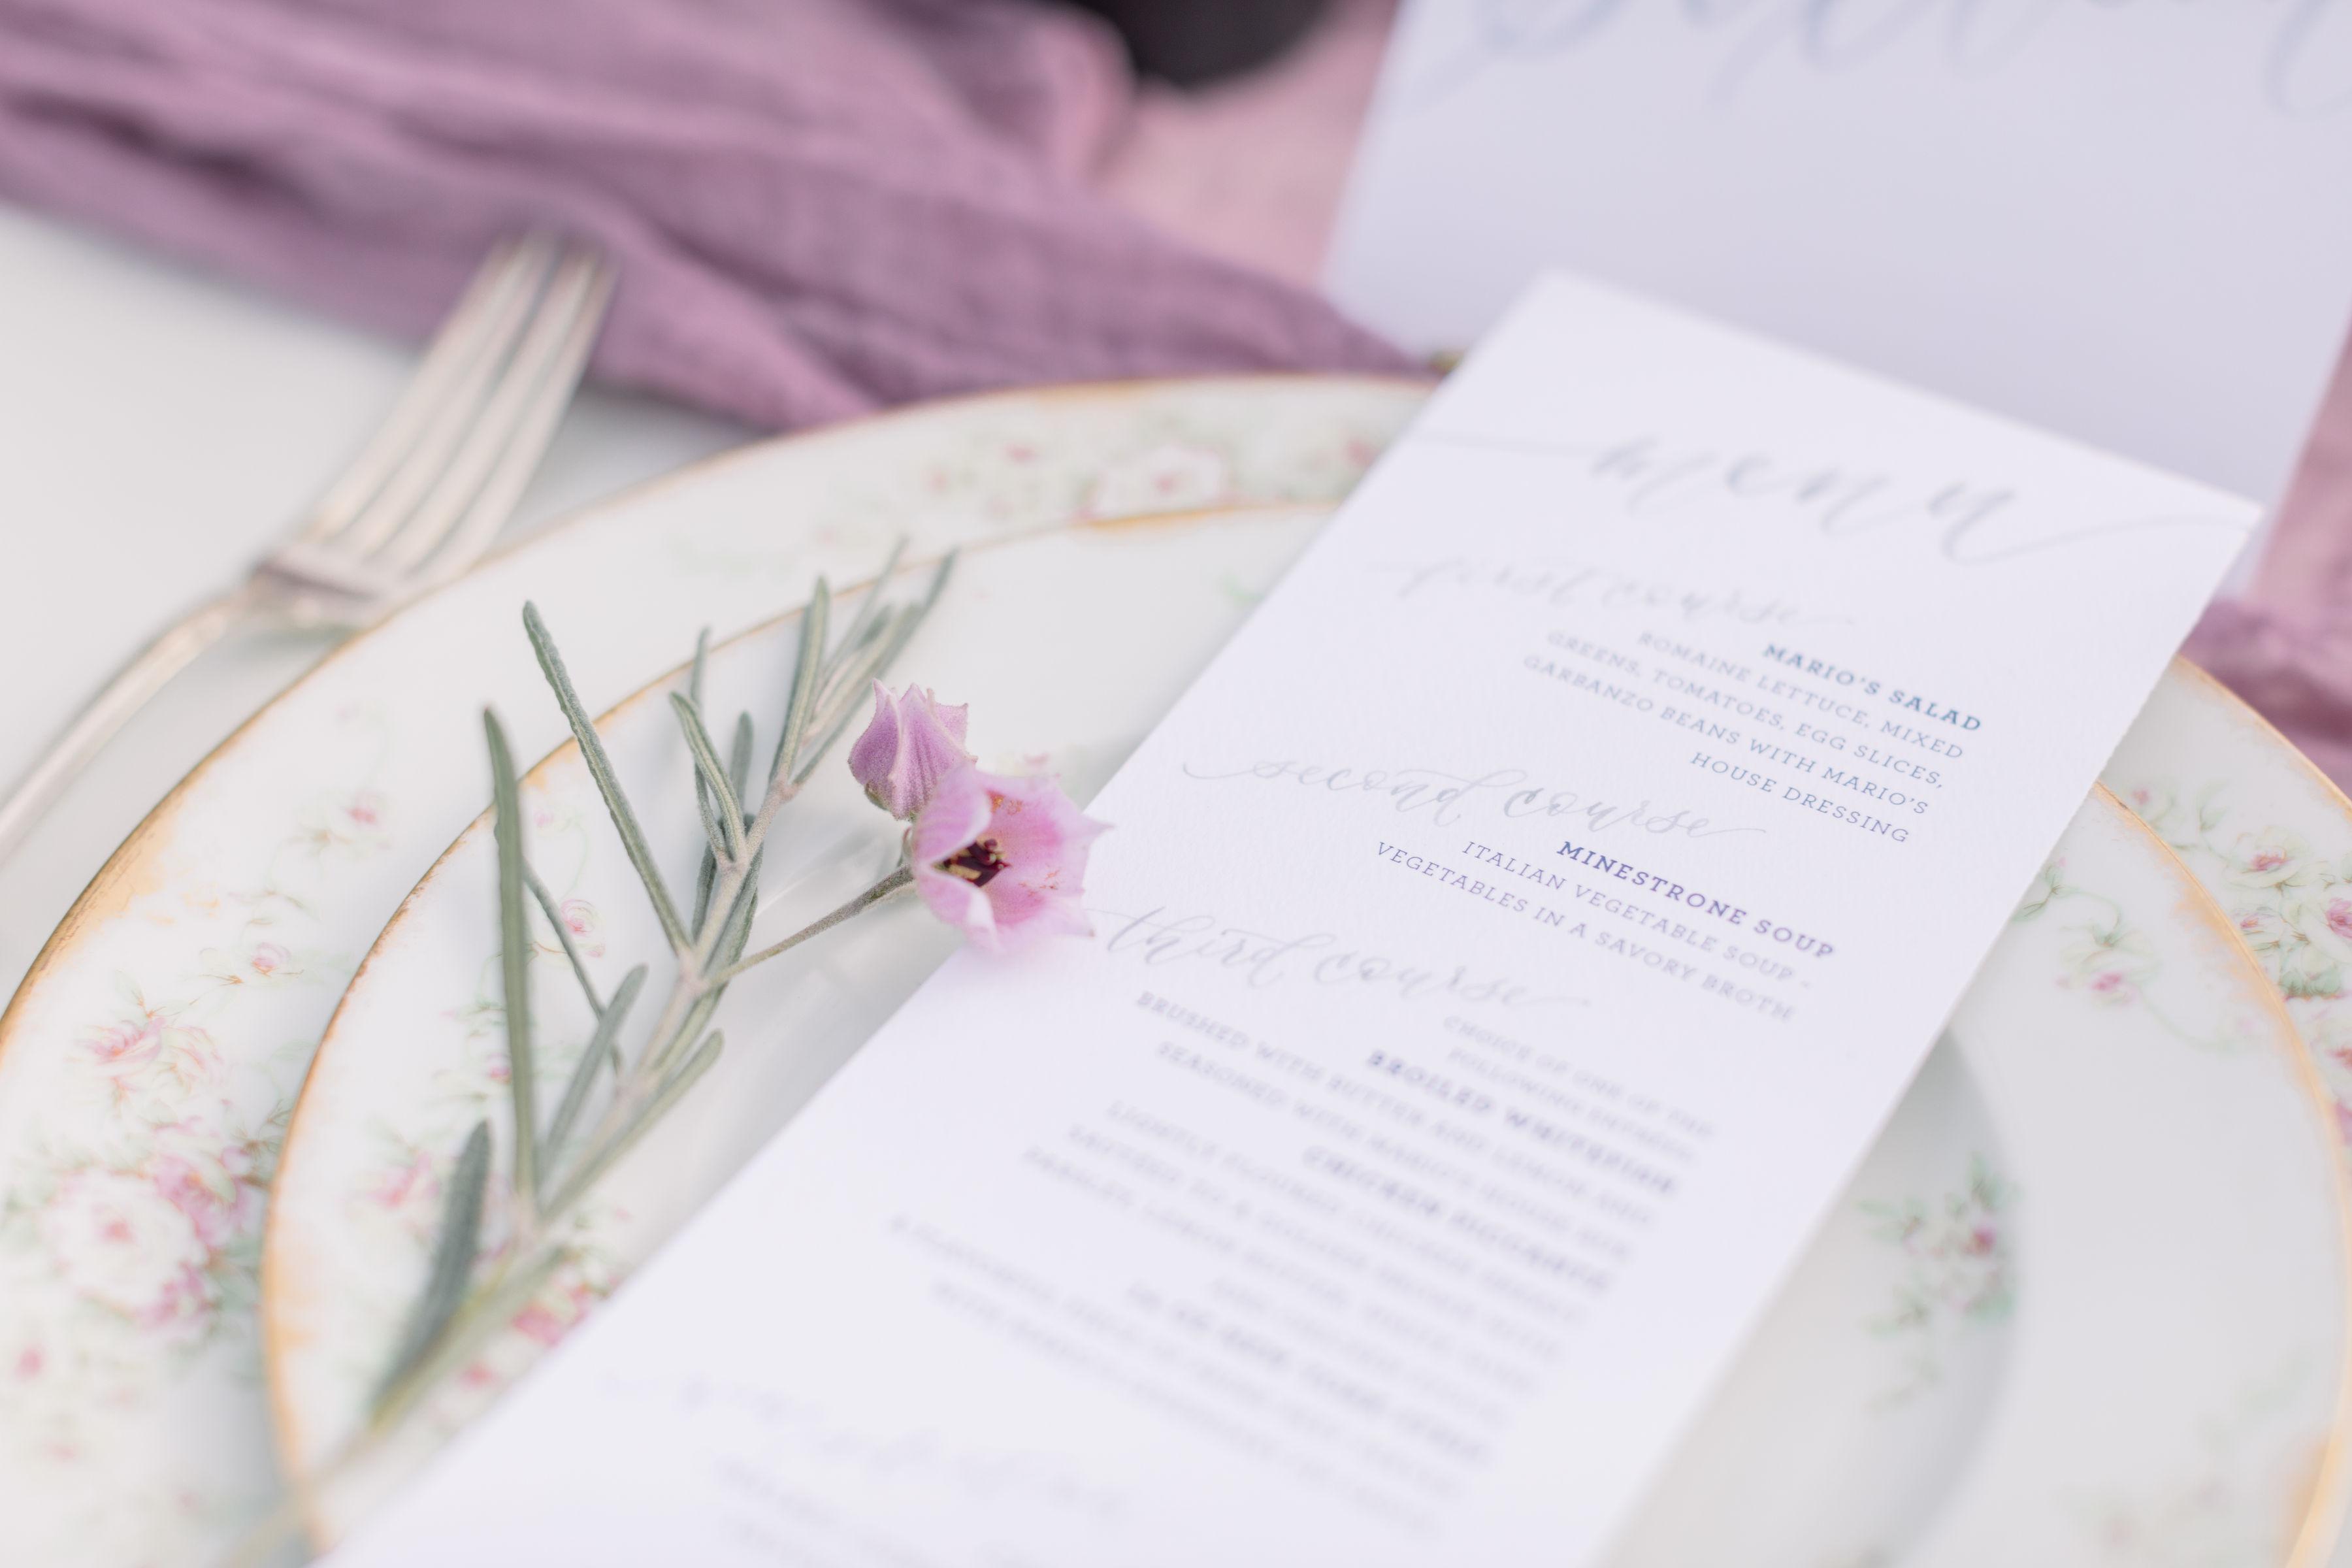 StephanieWeberPhotography-Gray and Purple Tablescape – Sam Allen Creates Watercolor Menus